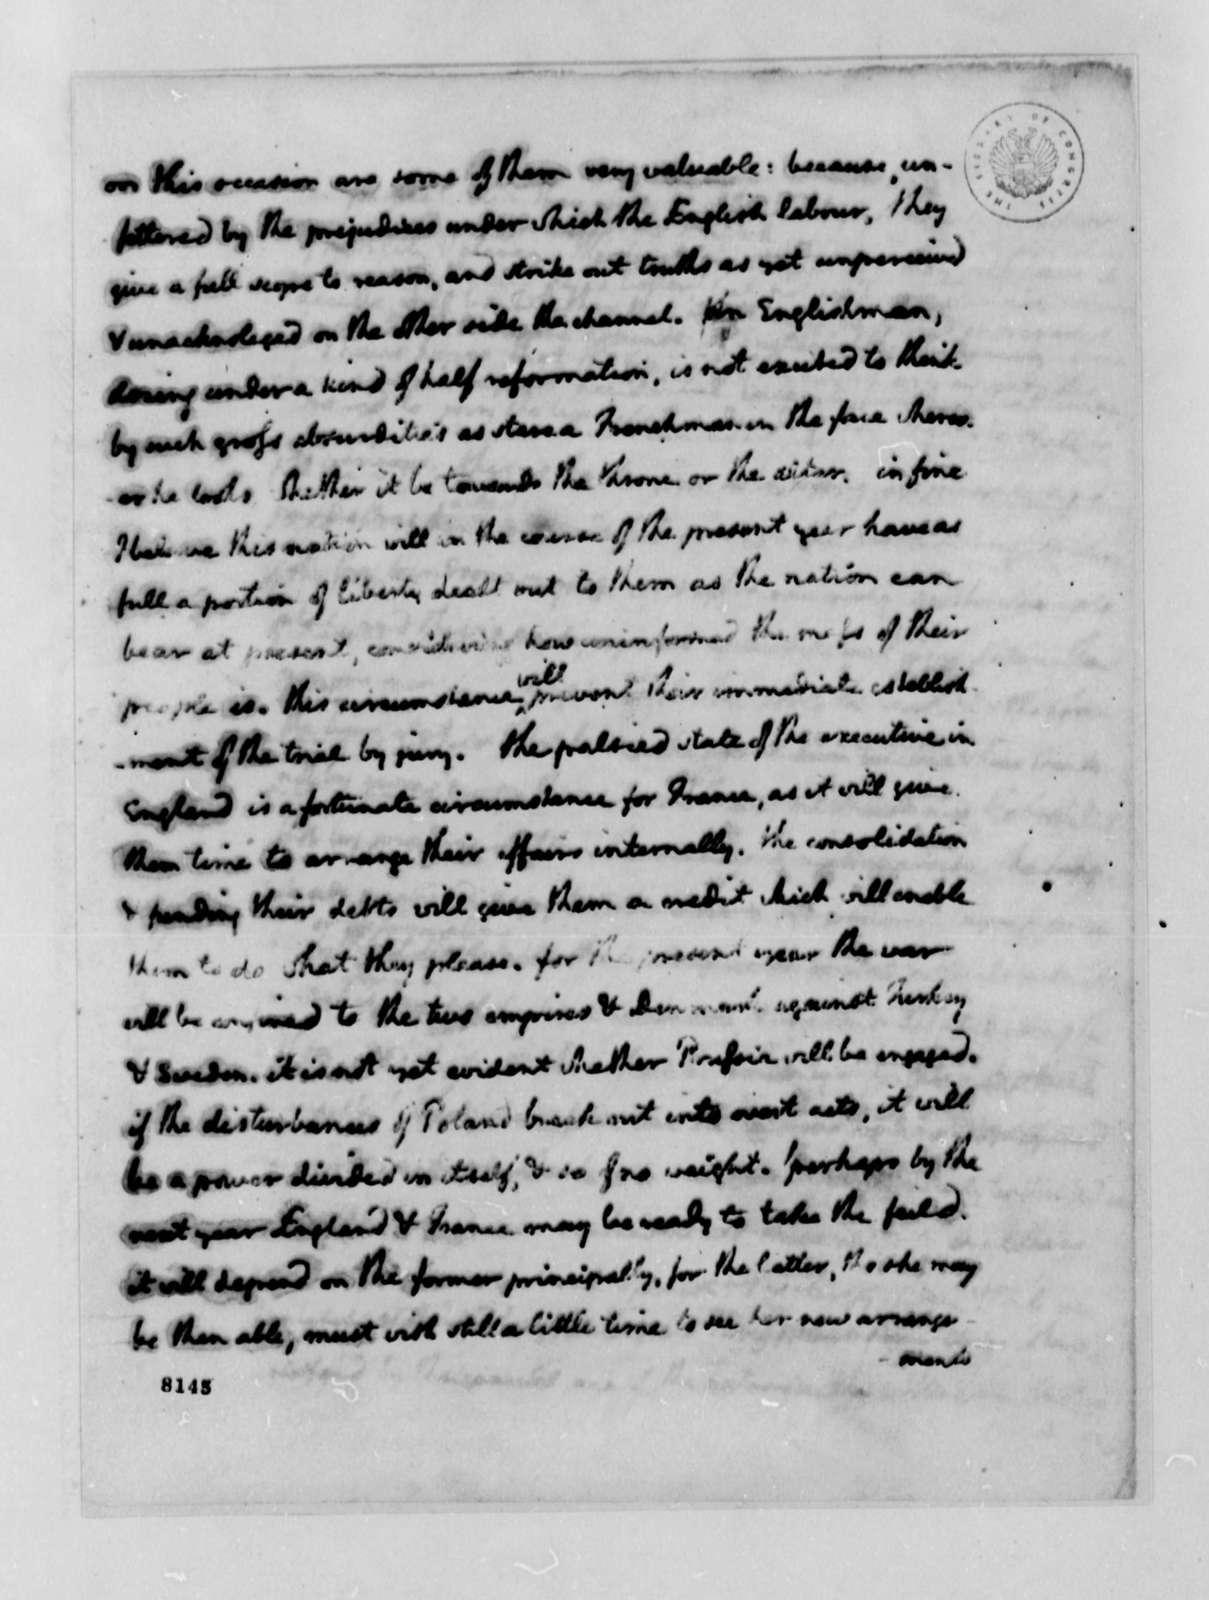 Thomas Jefferson to David Humphreys, March 18, 1789